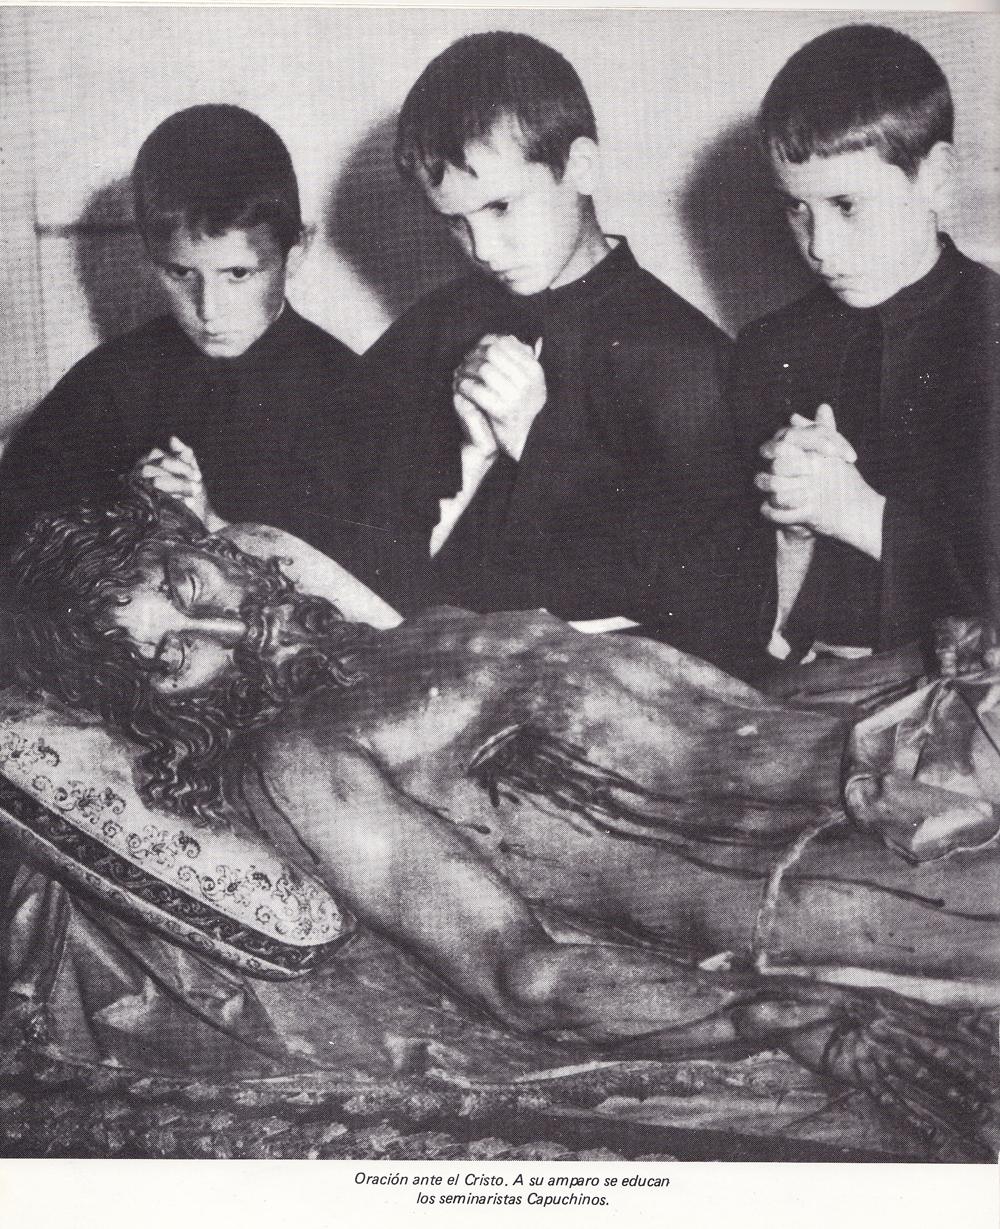 http://www.elpardo.net/wp-content/uploads/2012/01/Cristo_seminaristas.jpg